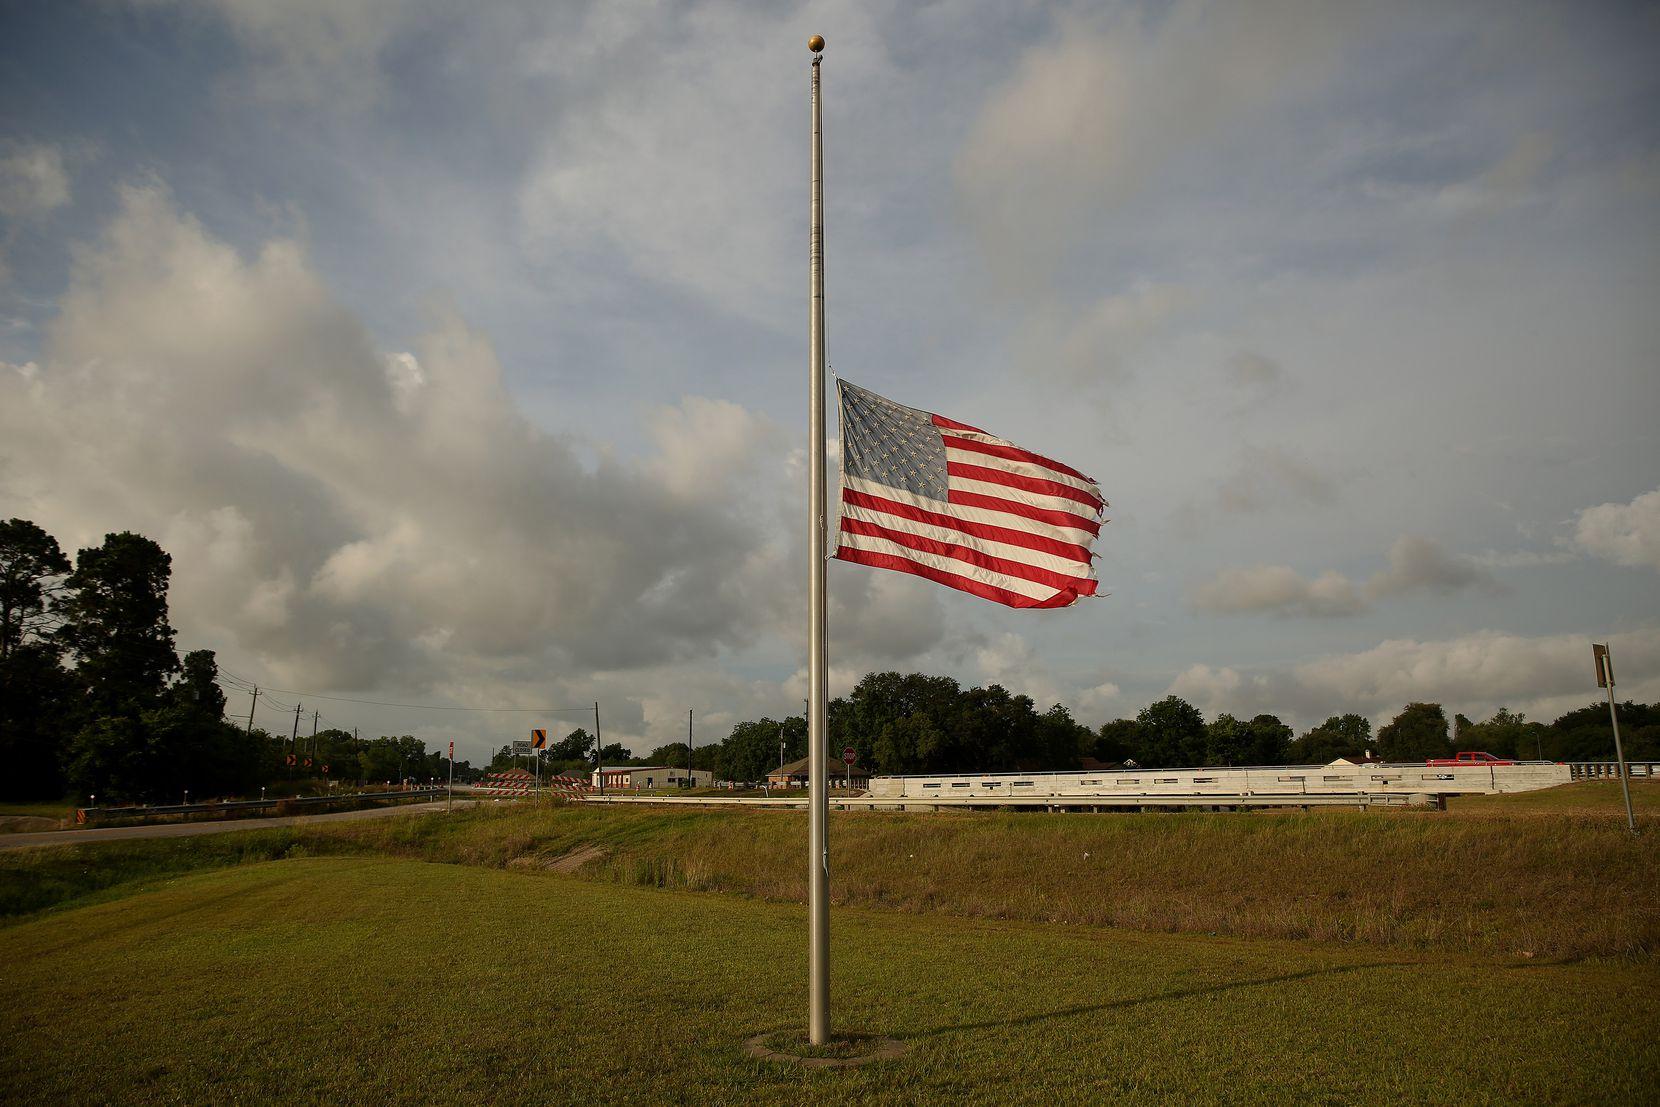 A flag flies at half staff on FM 646 in Santa Fe, Texas Sunday May 20, 2018.